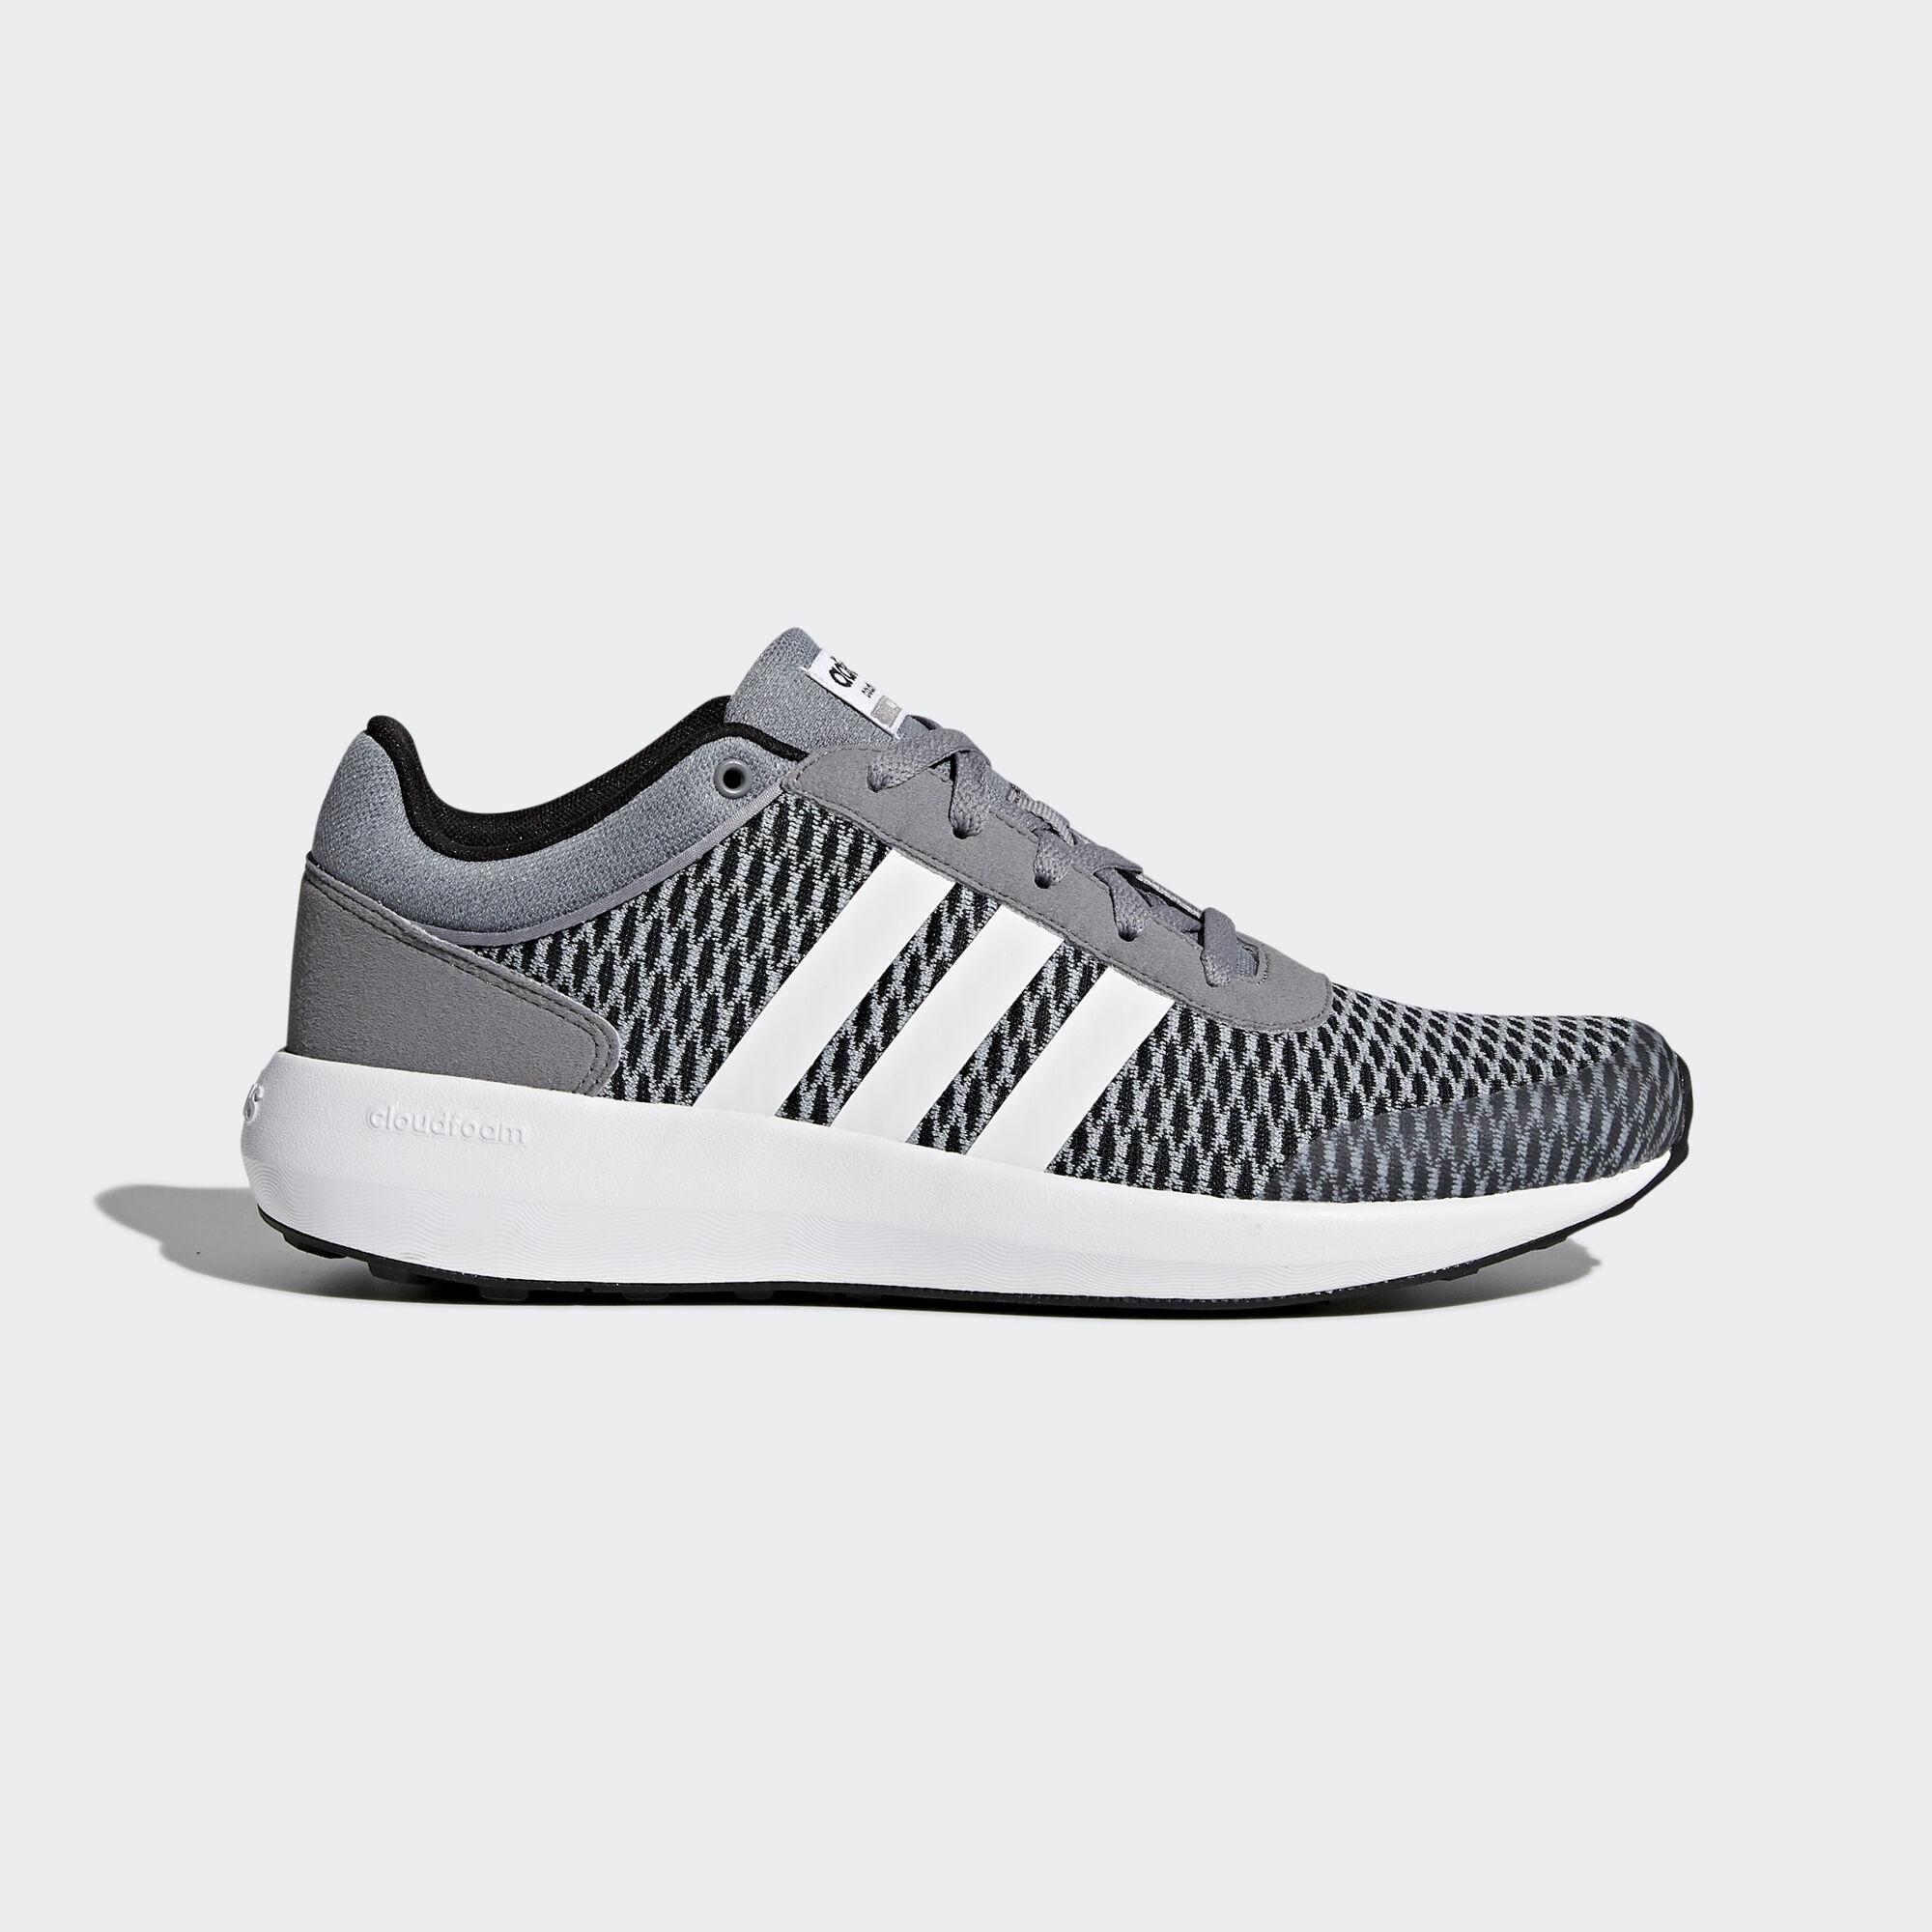 Adidas Neo Cloudfoam